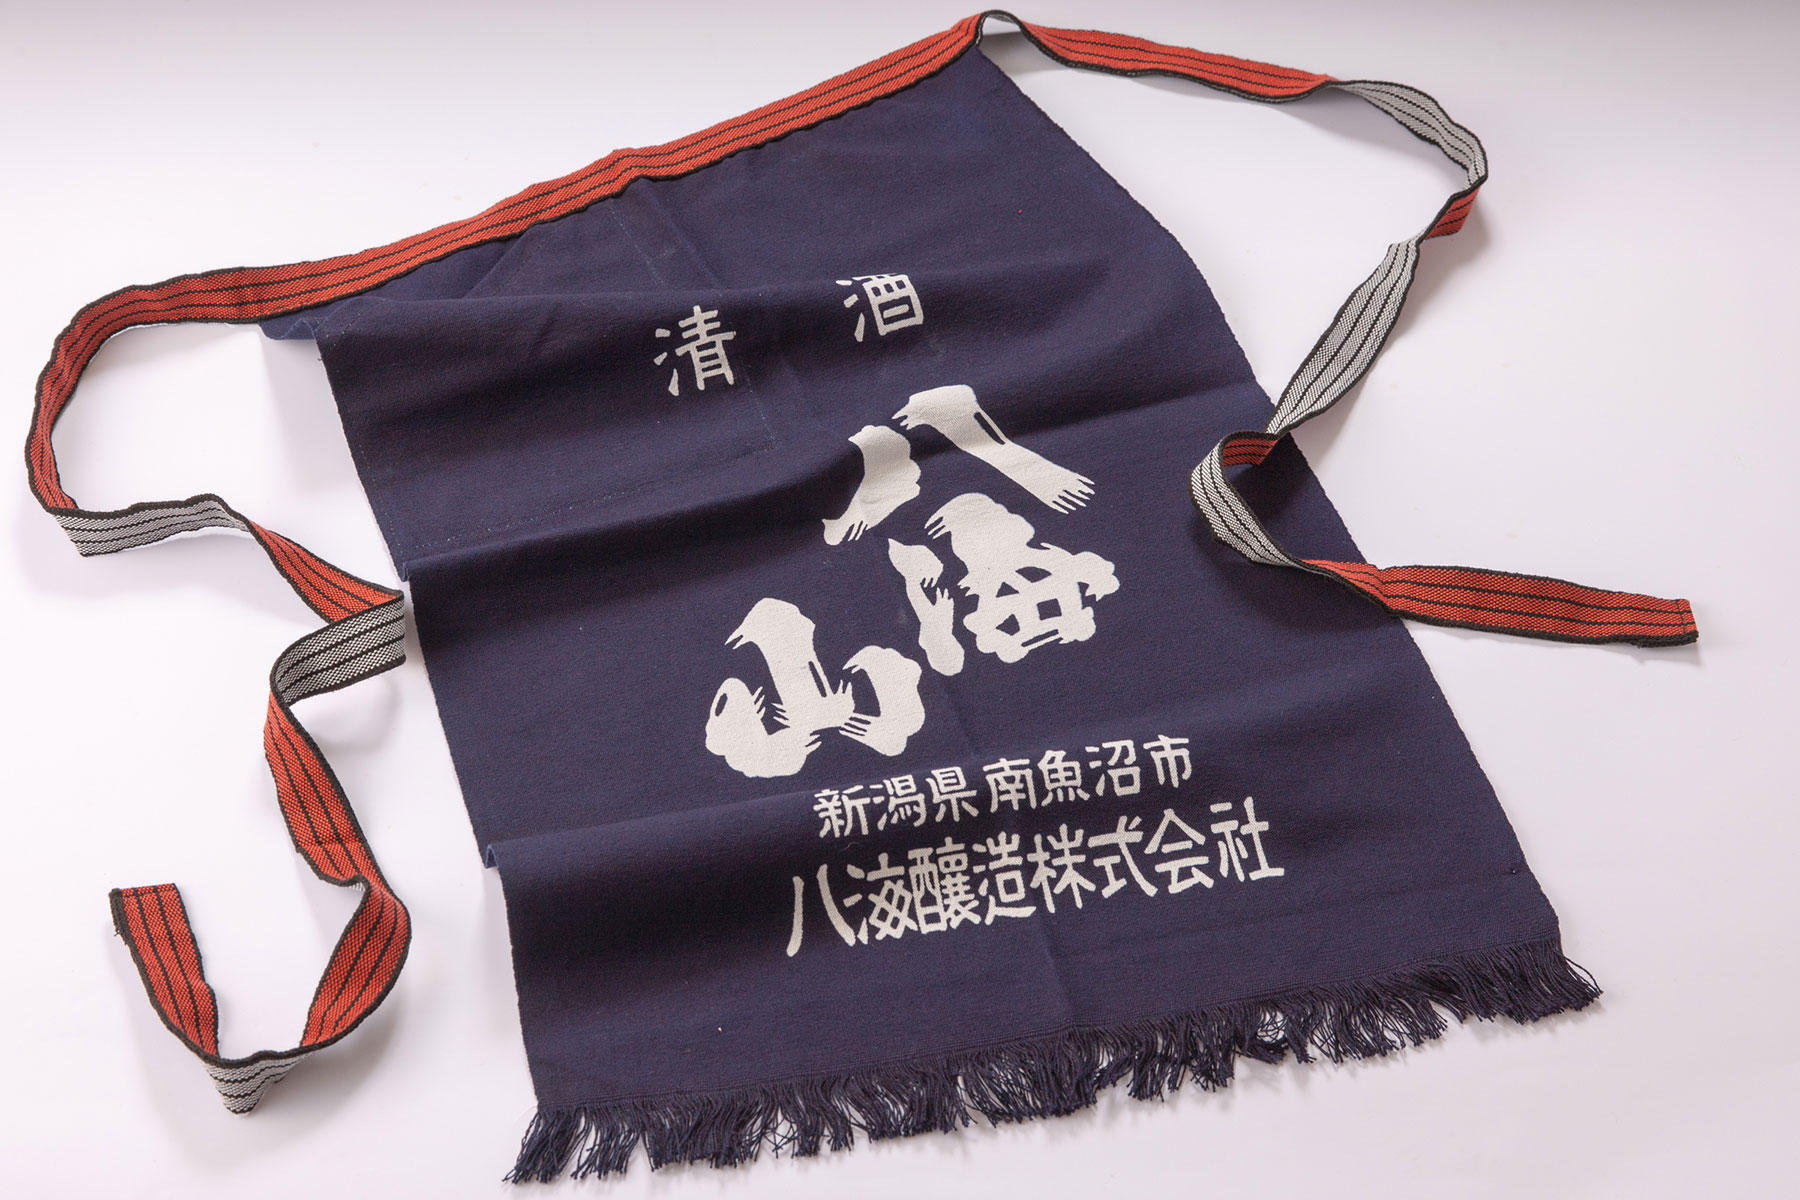 酒屋の前掛け(八海醸造・清酒 八海山)